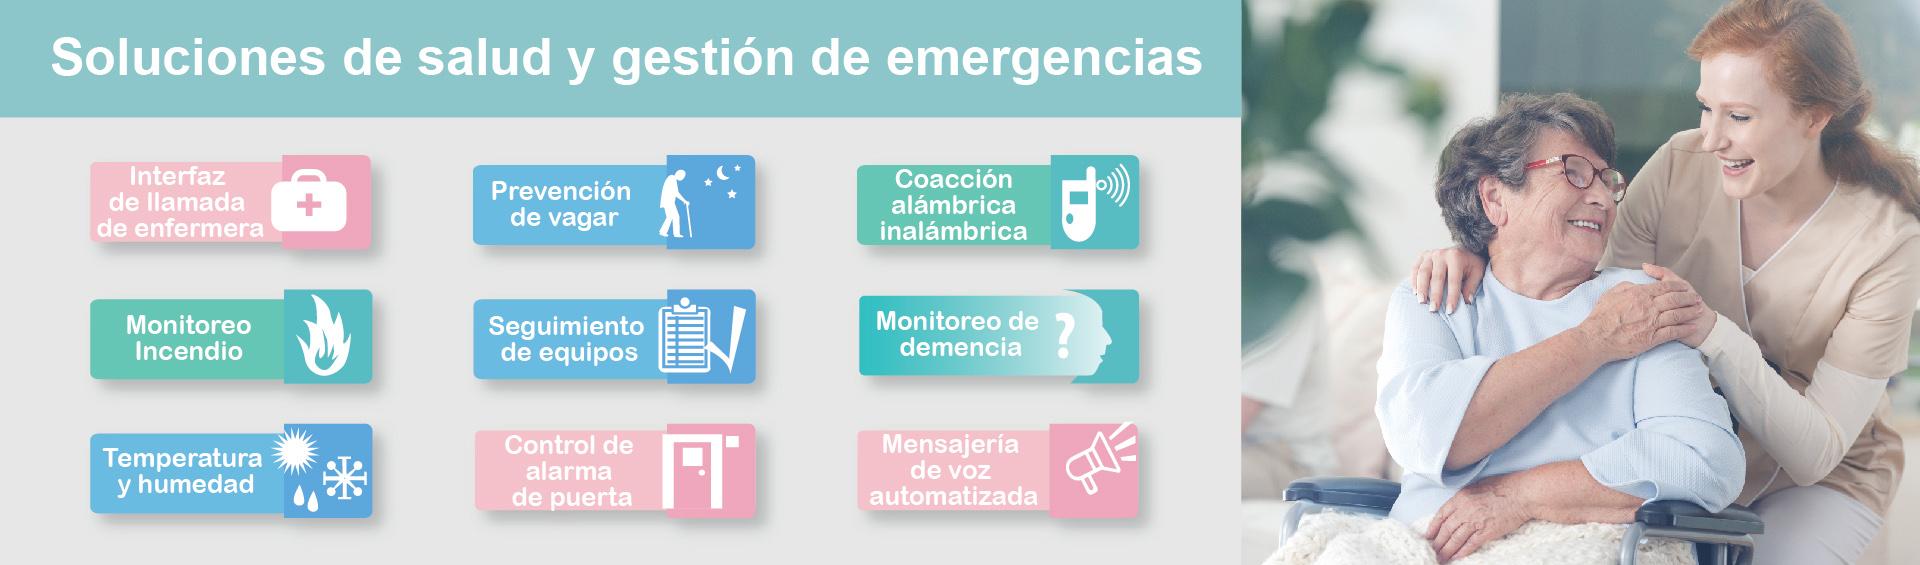 Slide1_Healthcare&Emergency_REV_OCT20